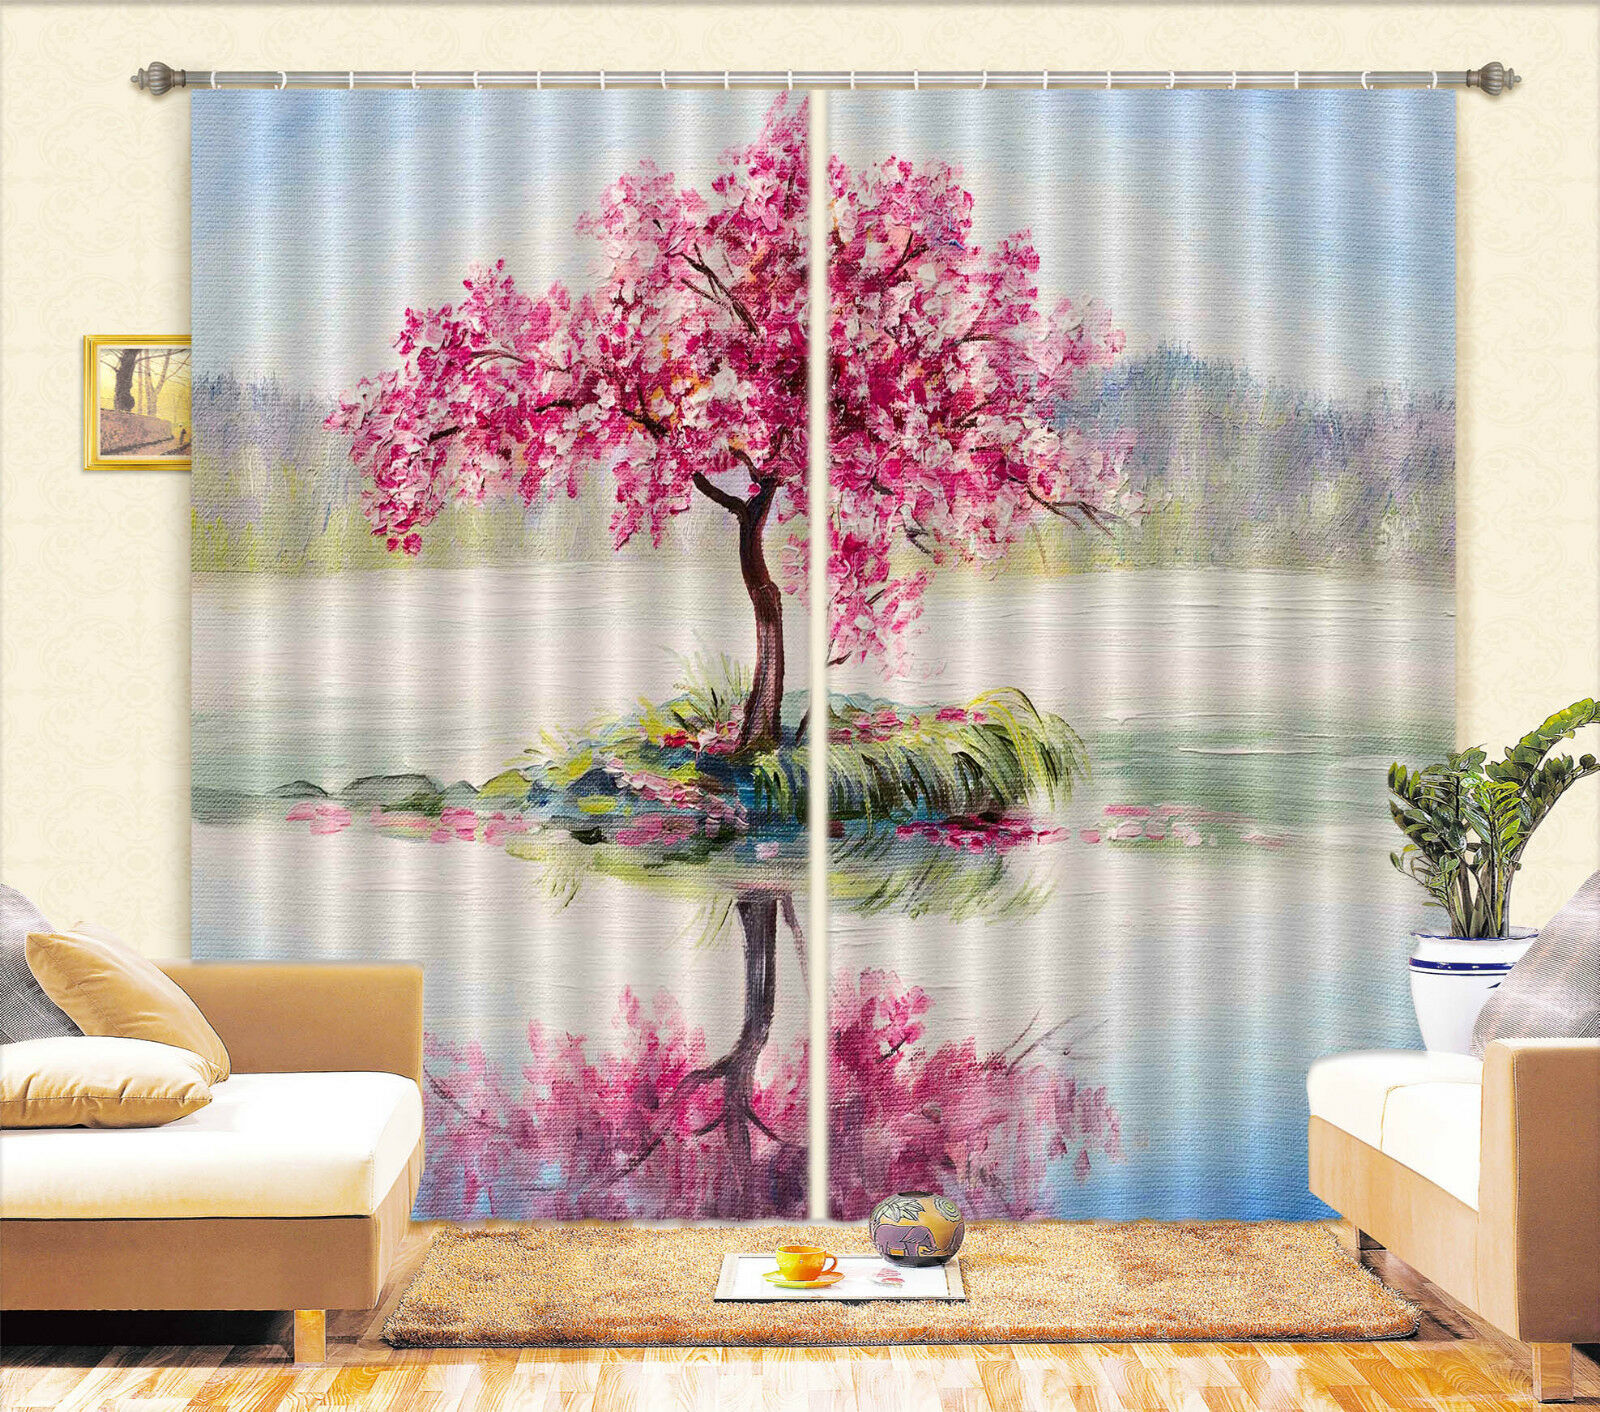 3d pinturas árbol 202 bloqueo foto cortina cortina de impresión sustancia cortinas de ventana